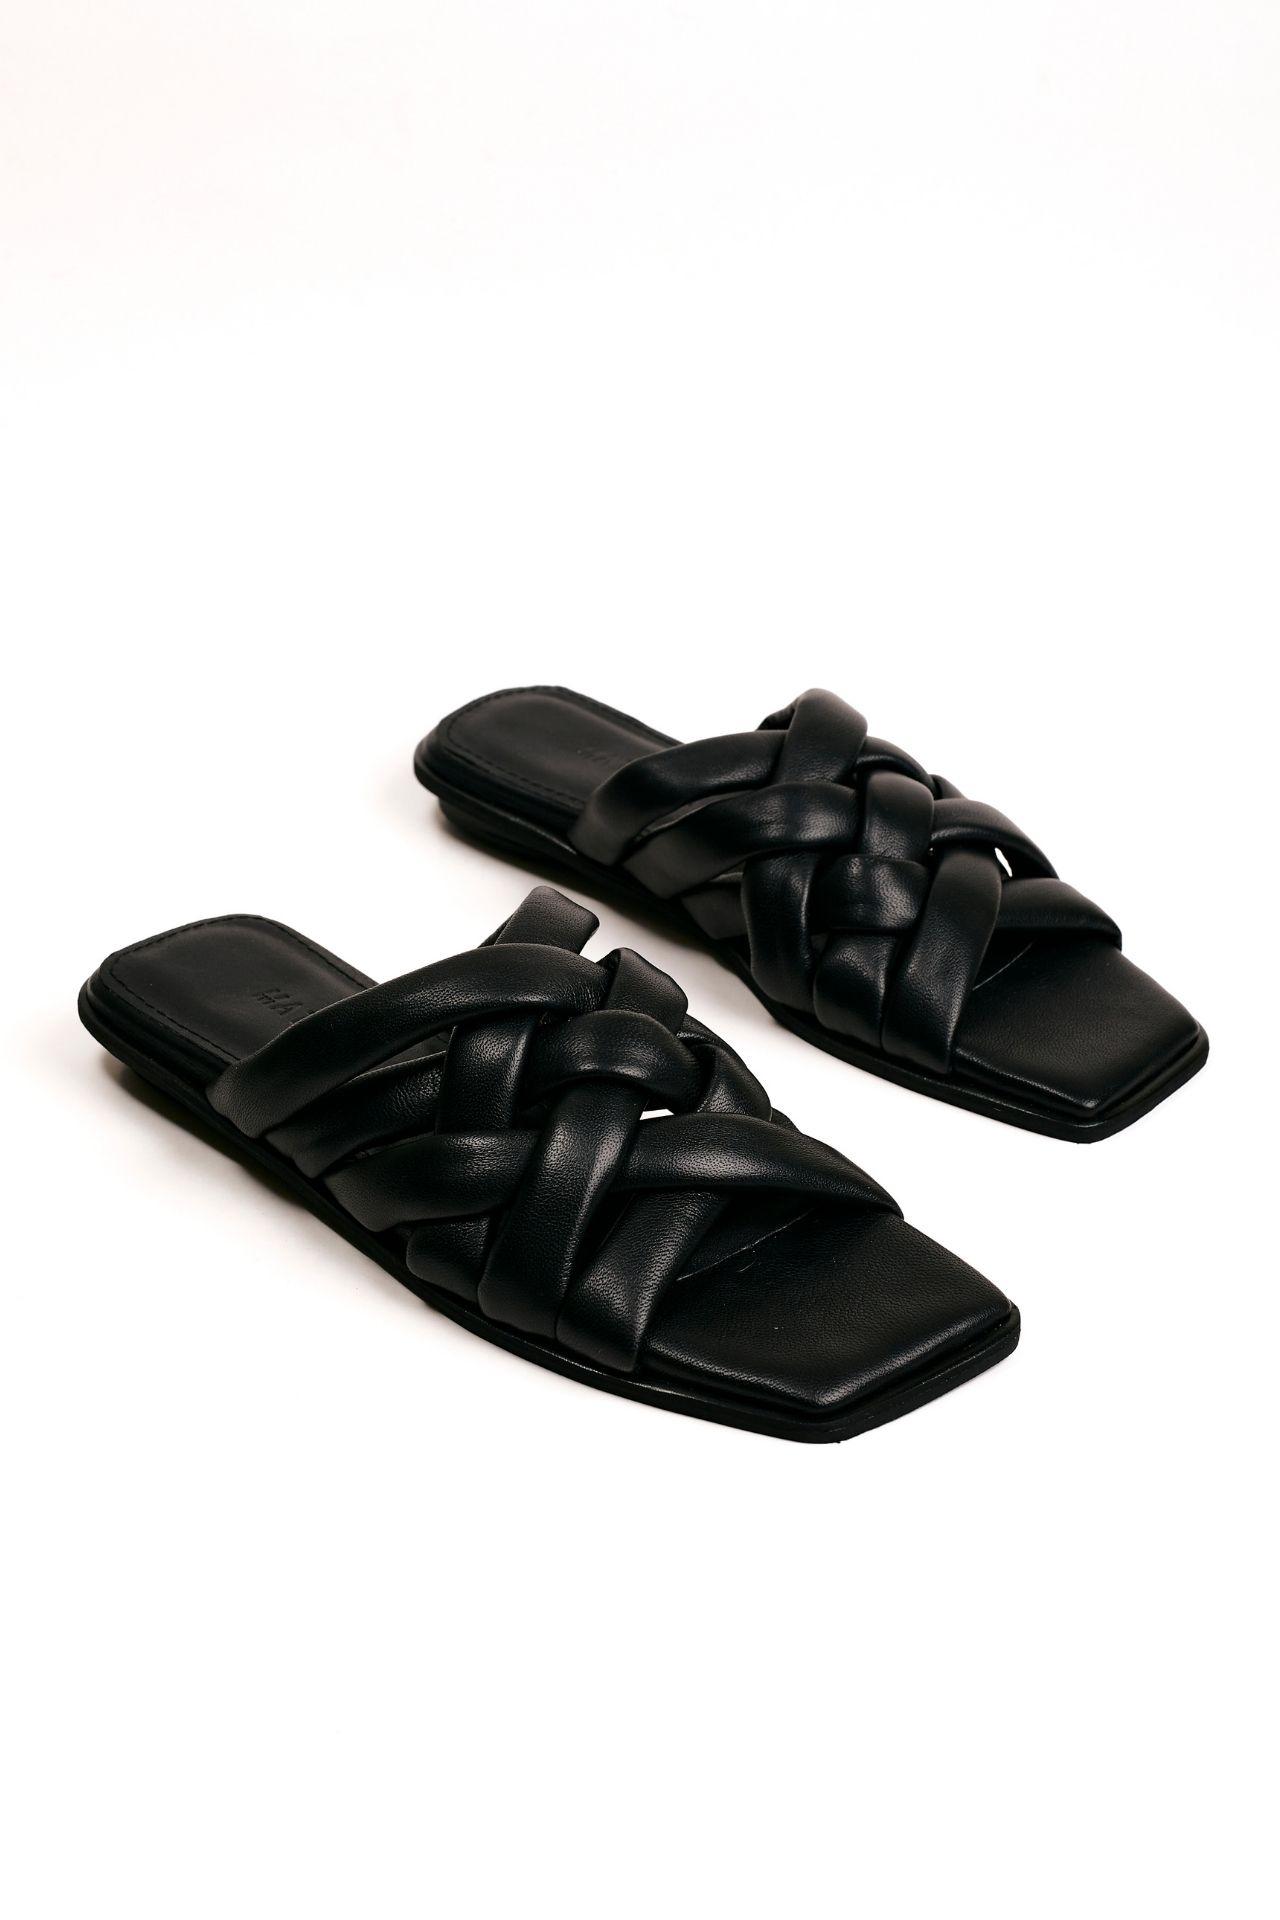 Sandalias con tiras cruzadas de cuero negro